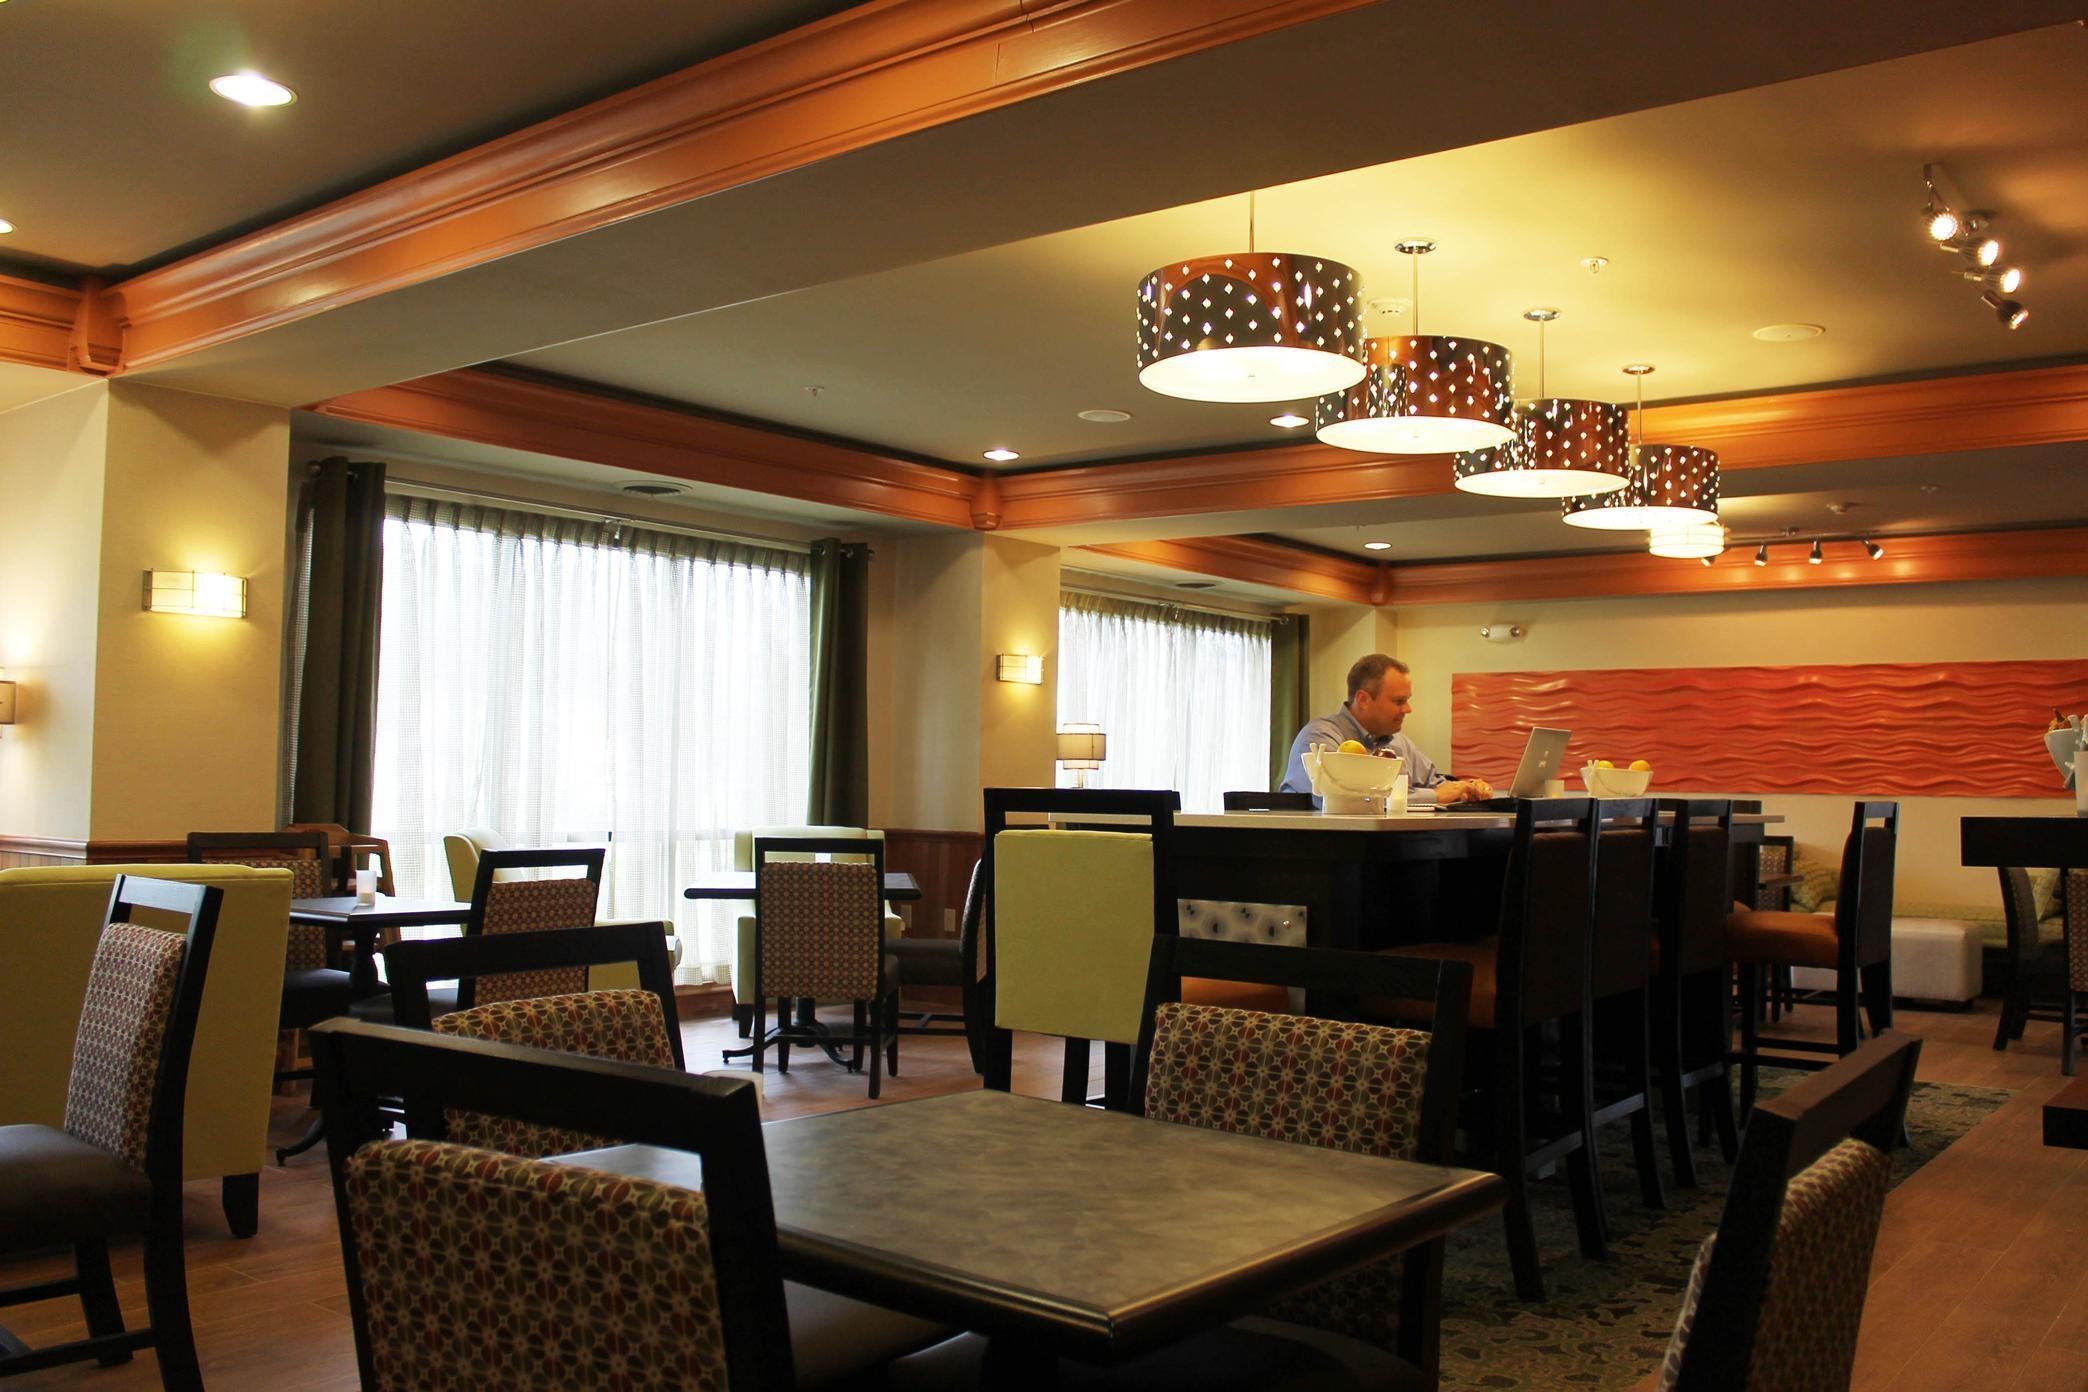 Hampton Inn & Suites Mansfield-South @ I-71 image 2